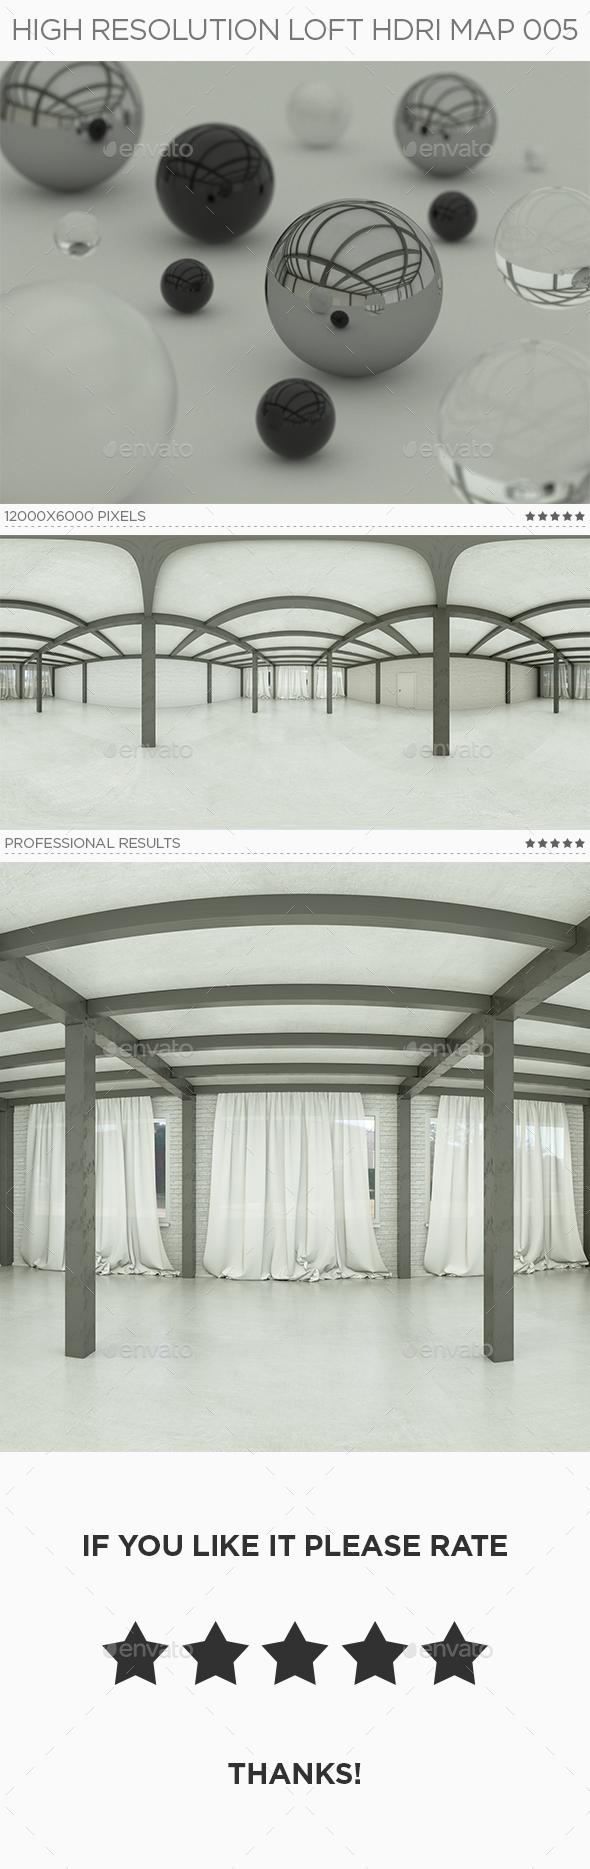 High Resolution Loft HDRi Map 005 - 3DOcean Item for Sale